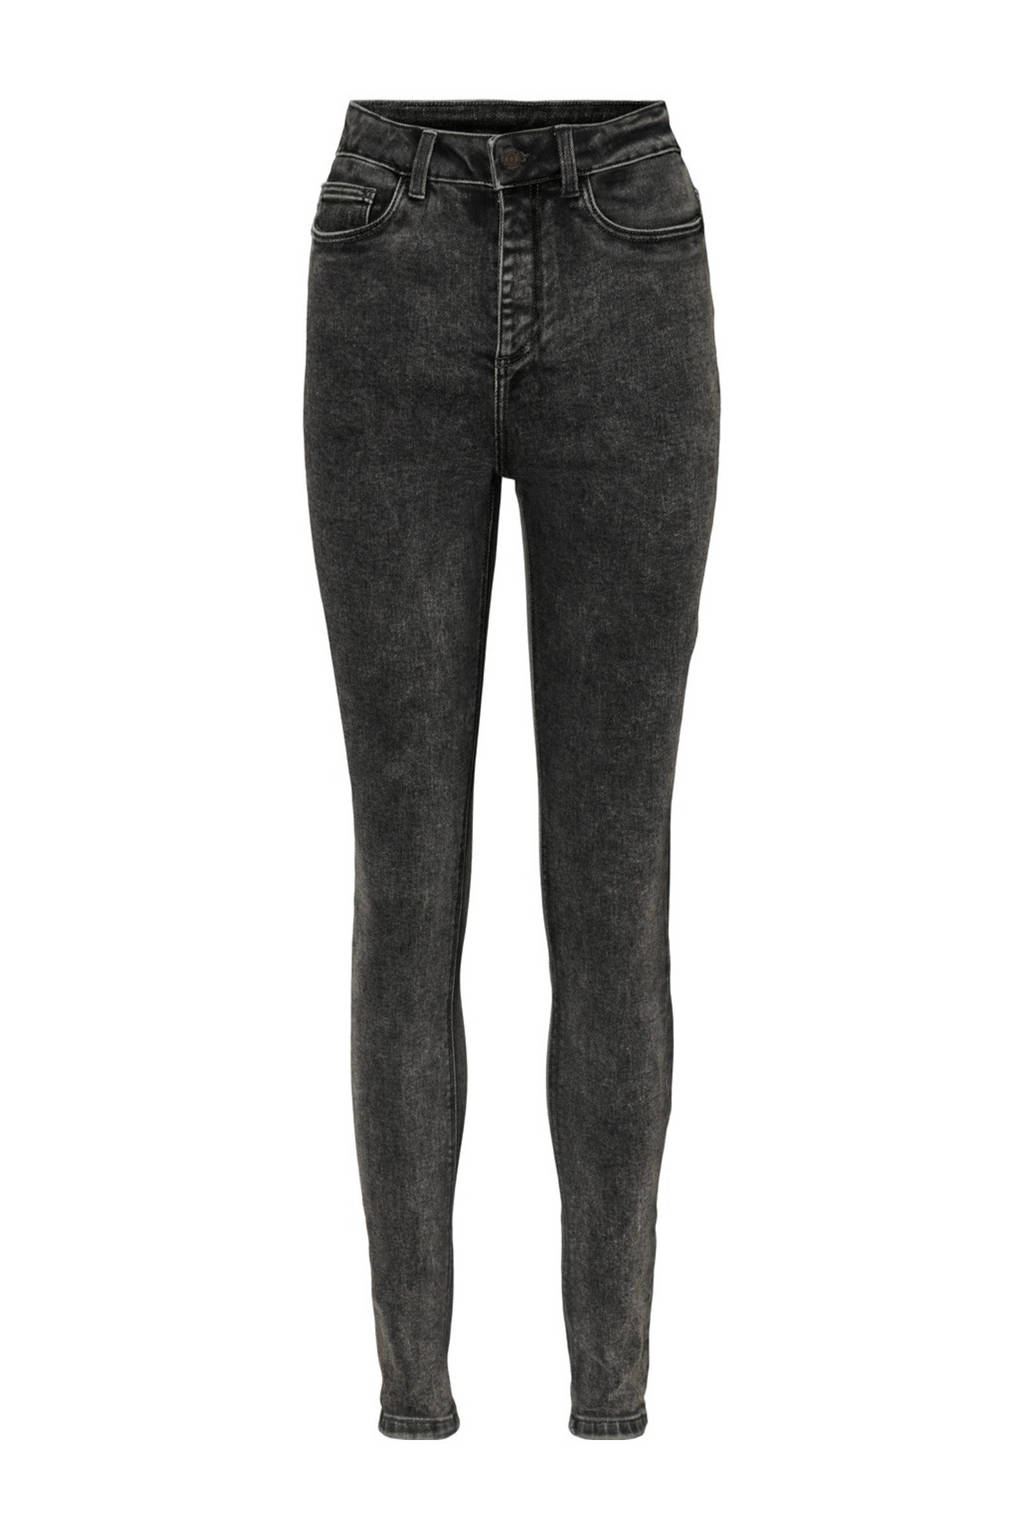 NOISY MAY high waist skinny jeans NMCALLIE black, Donkergrijs